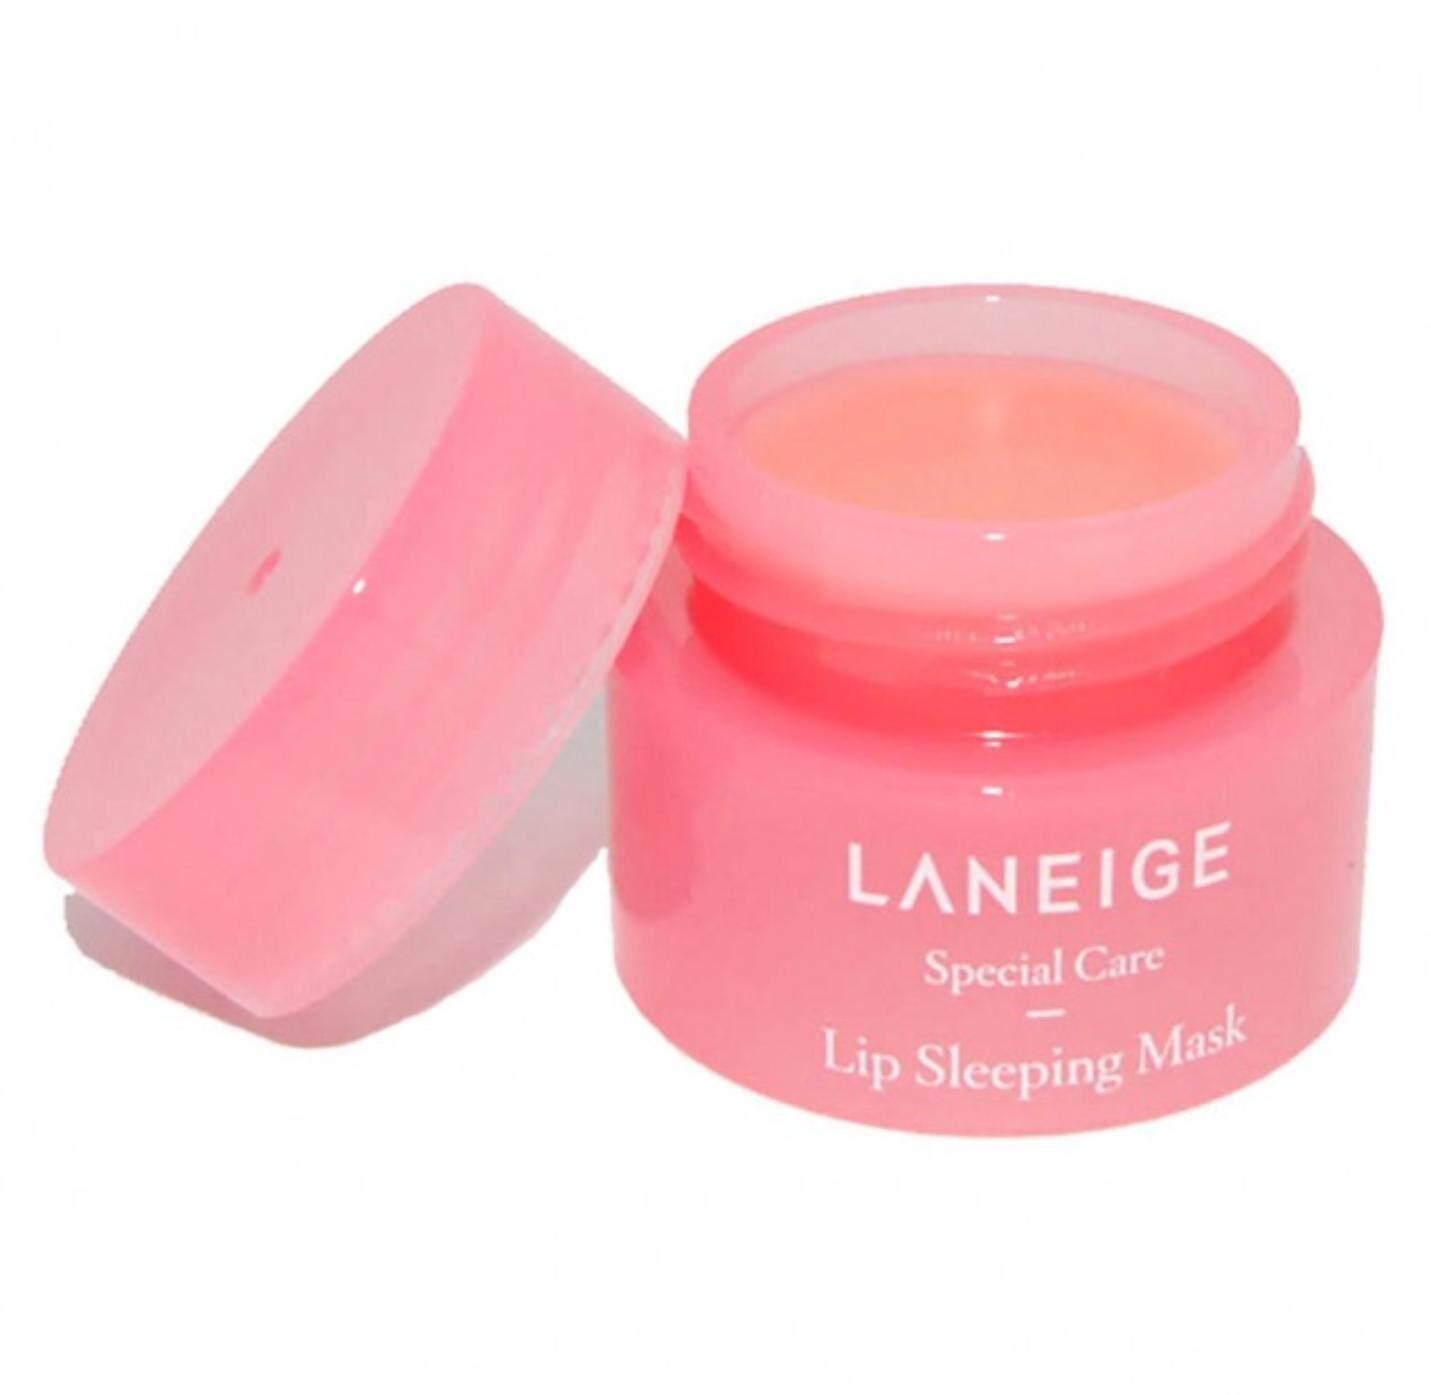 Laneige Lip Sleeping Mask [berry] (3 G) มาส์กปากก่อนนอน ขายดี ของแท้ 100% [special Care Berry].